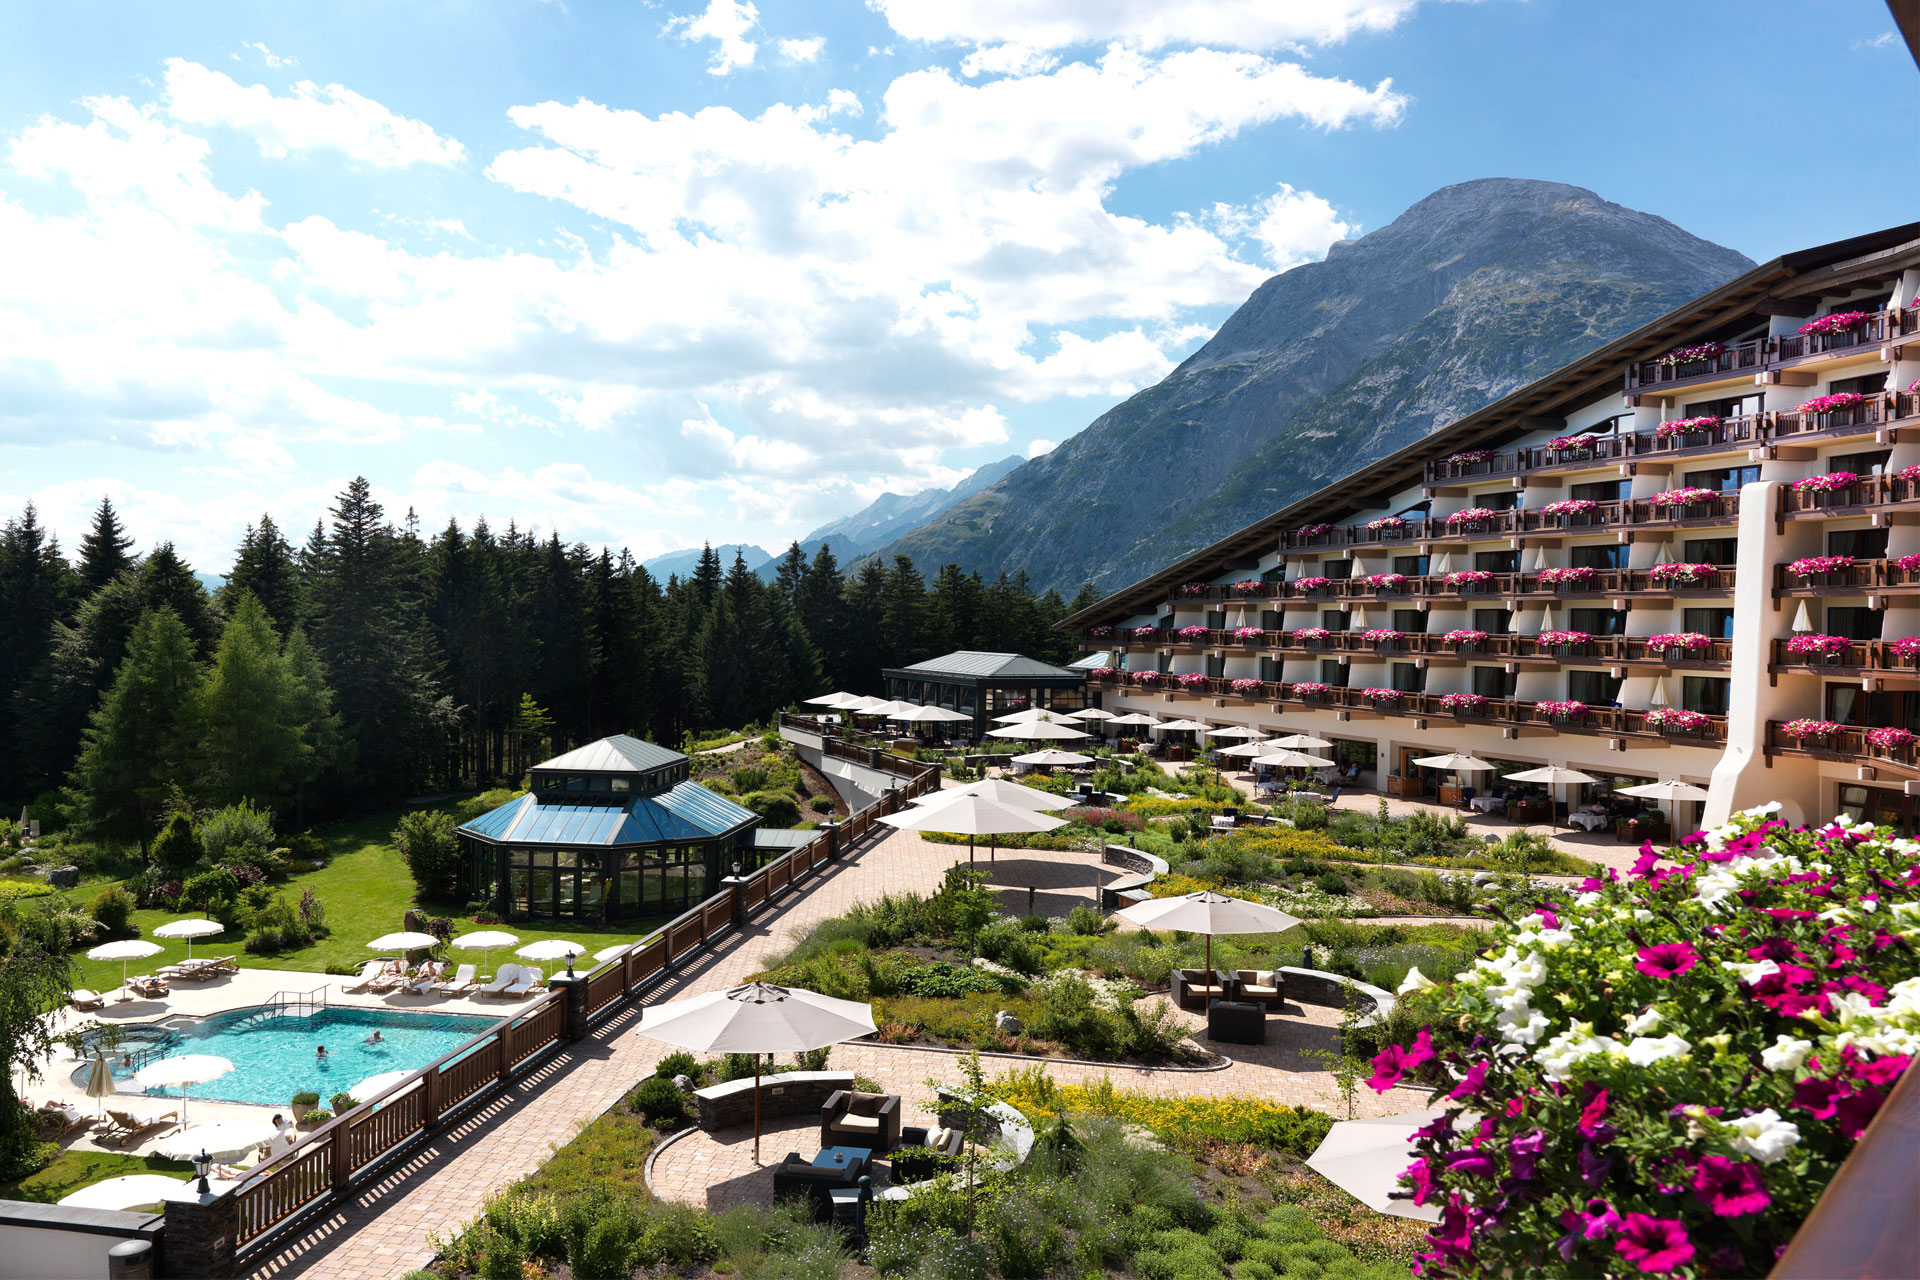 Interalpen-Hotel Tyrol in Austria